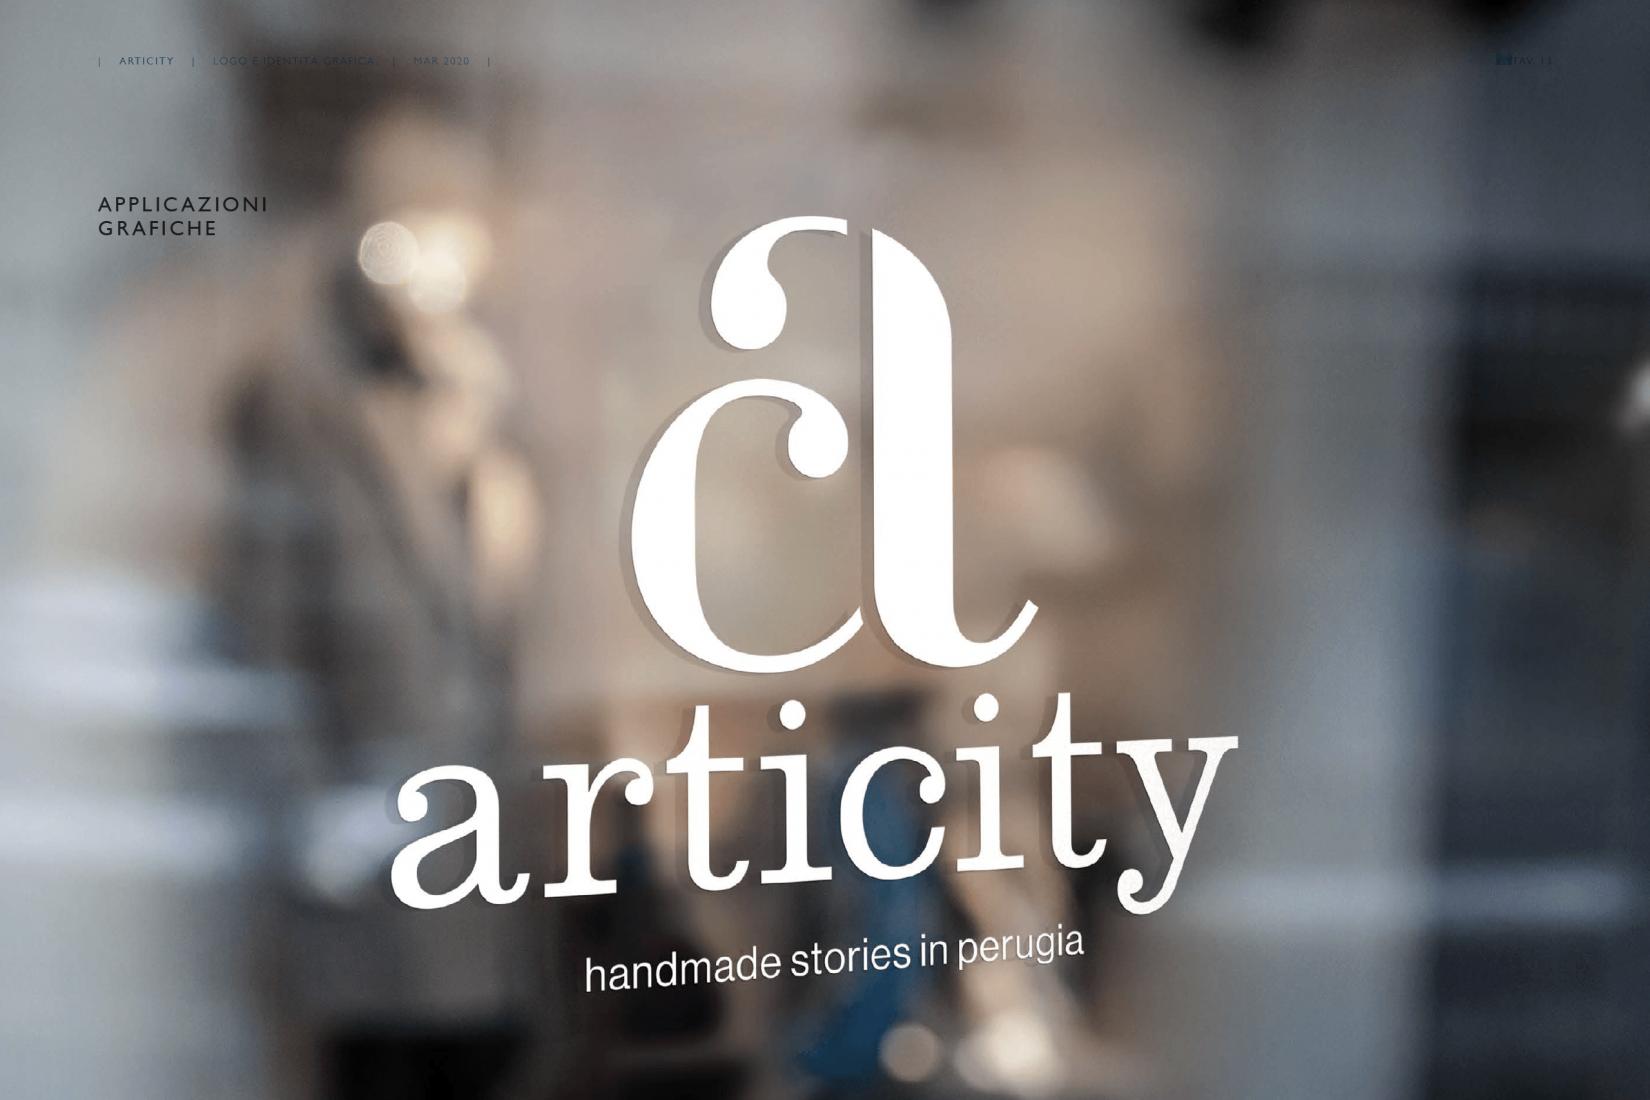 articity.it